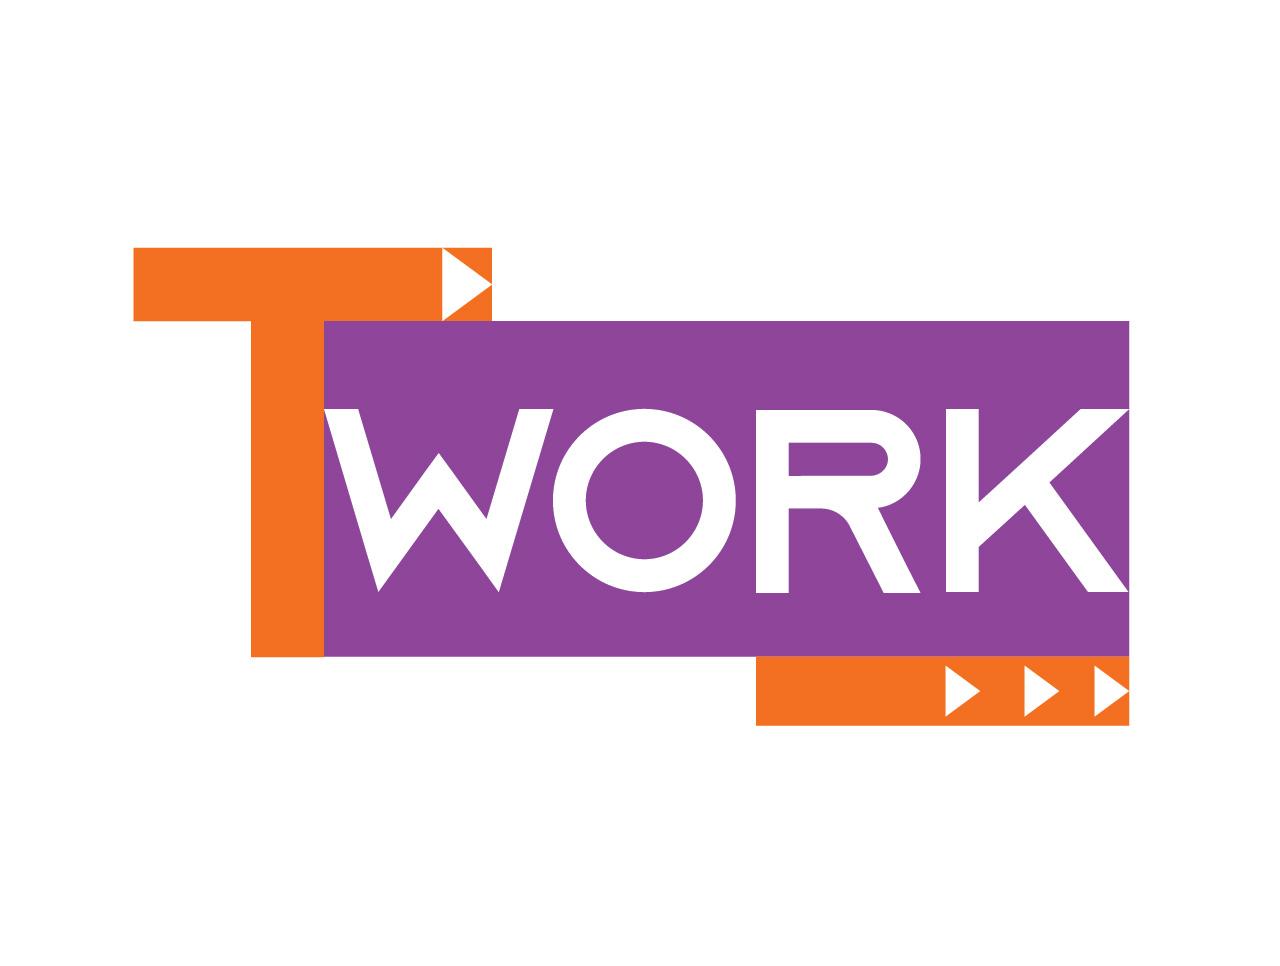 T-Work 2020